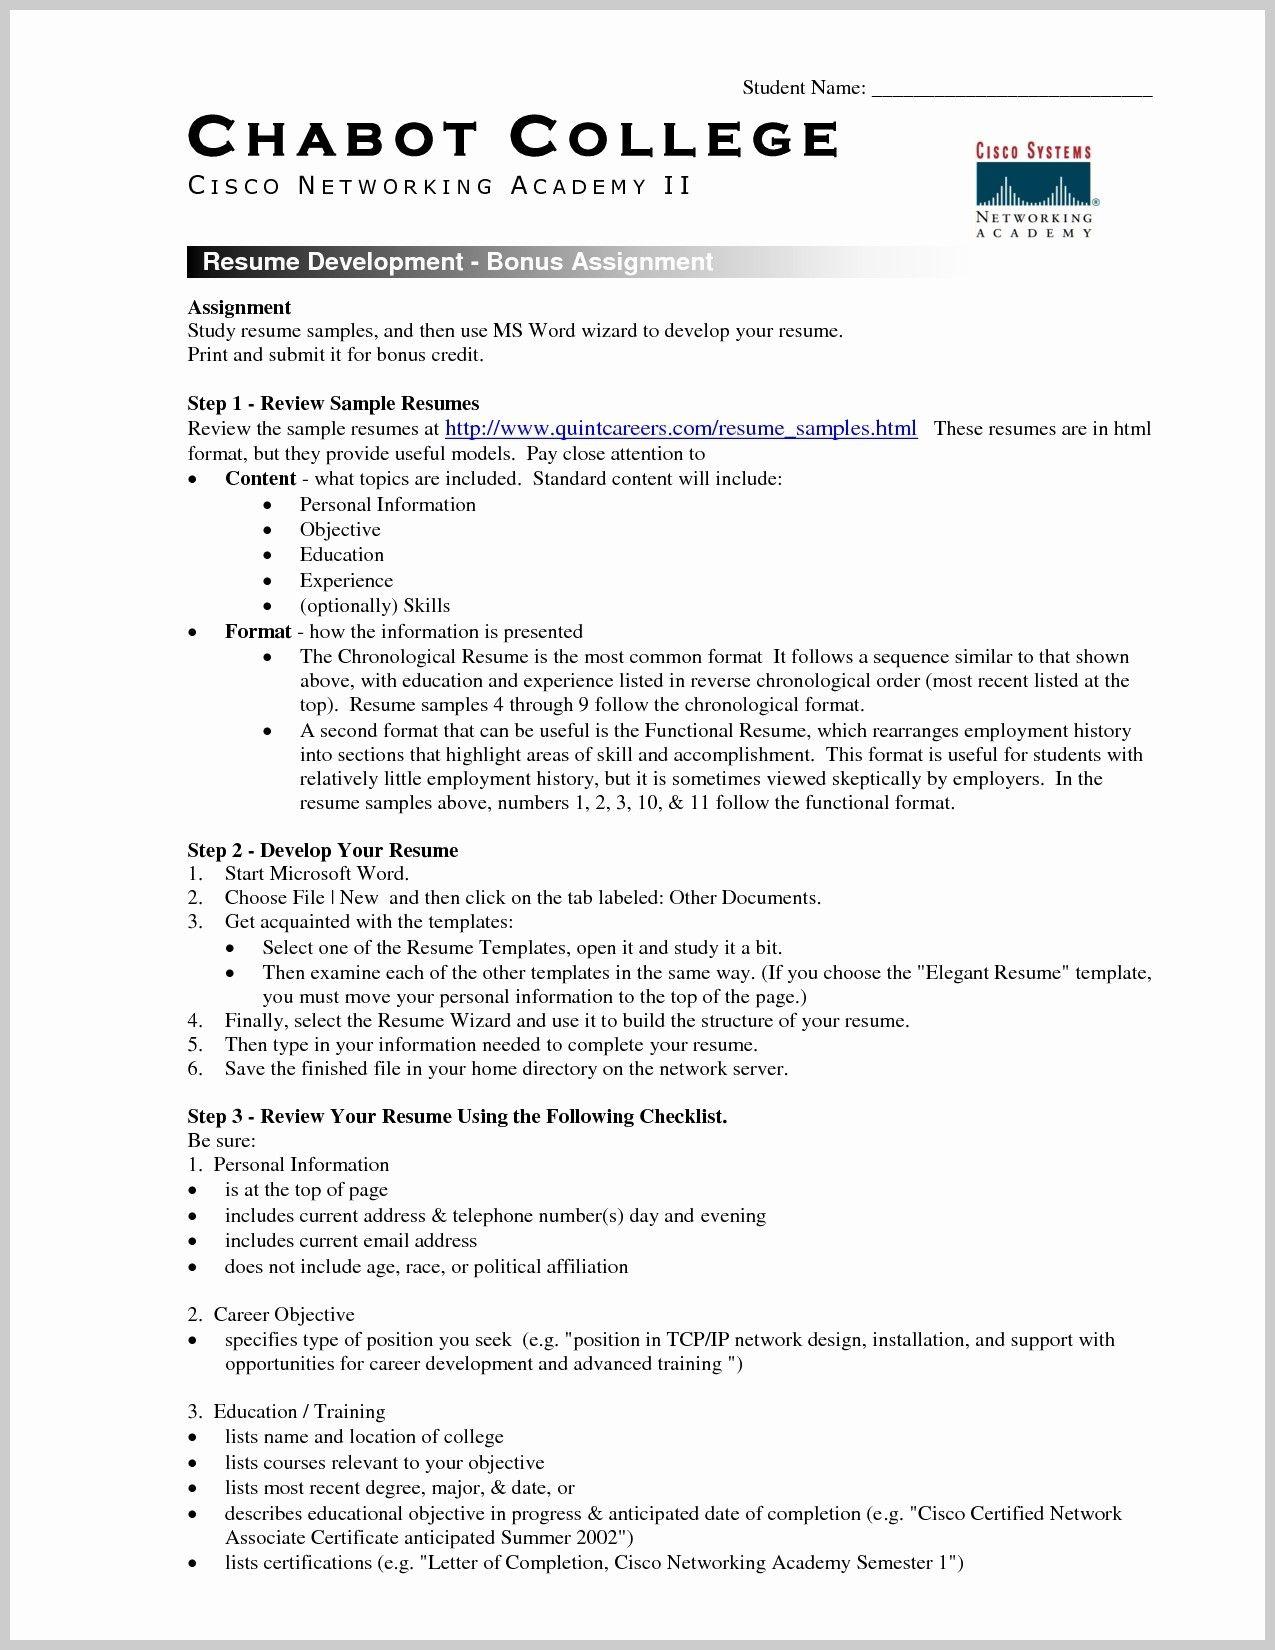 Resume Sample Pdf In 2020 Student Resume Template Resume Template Word Microsoft Word Resume Template